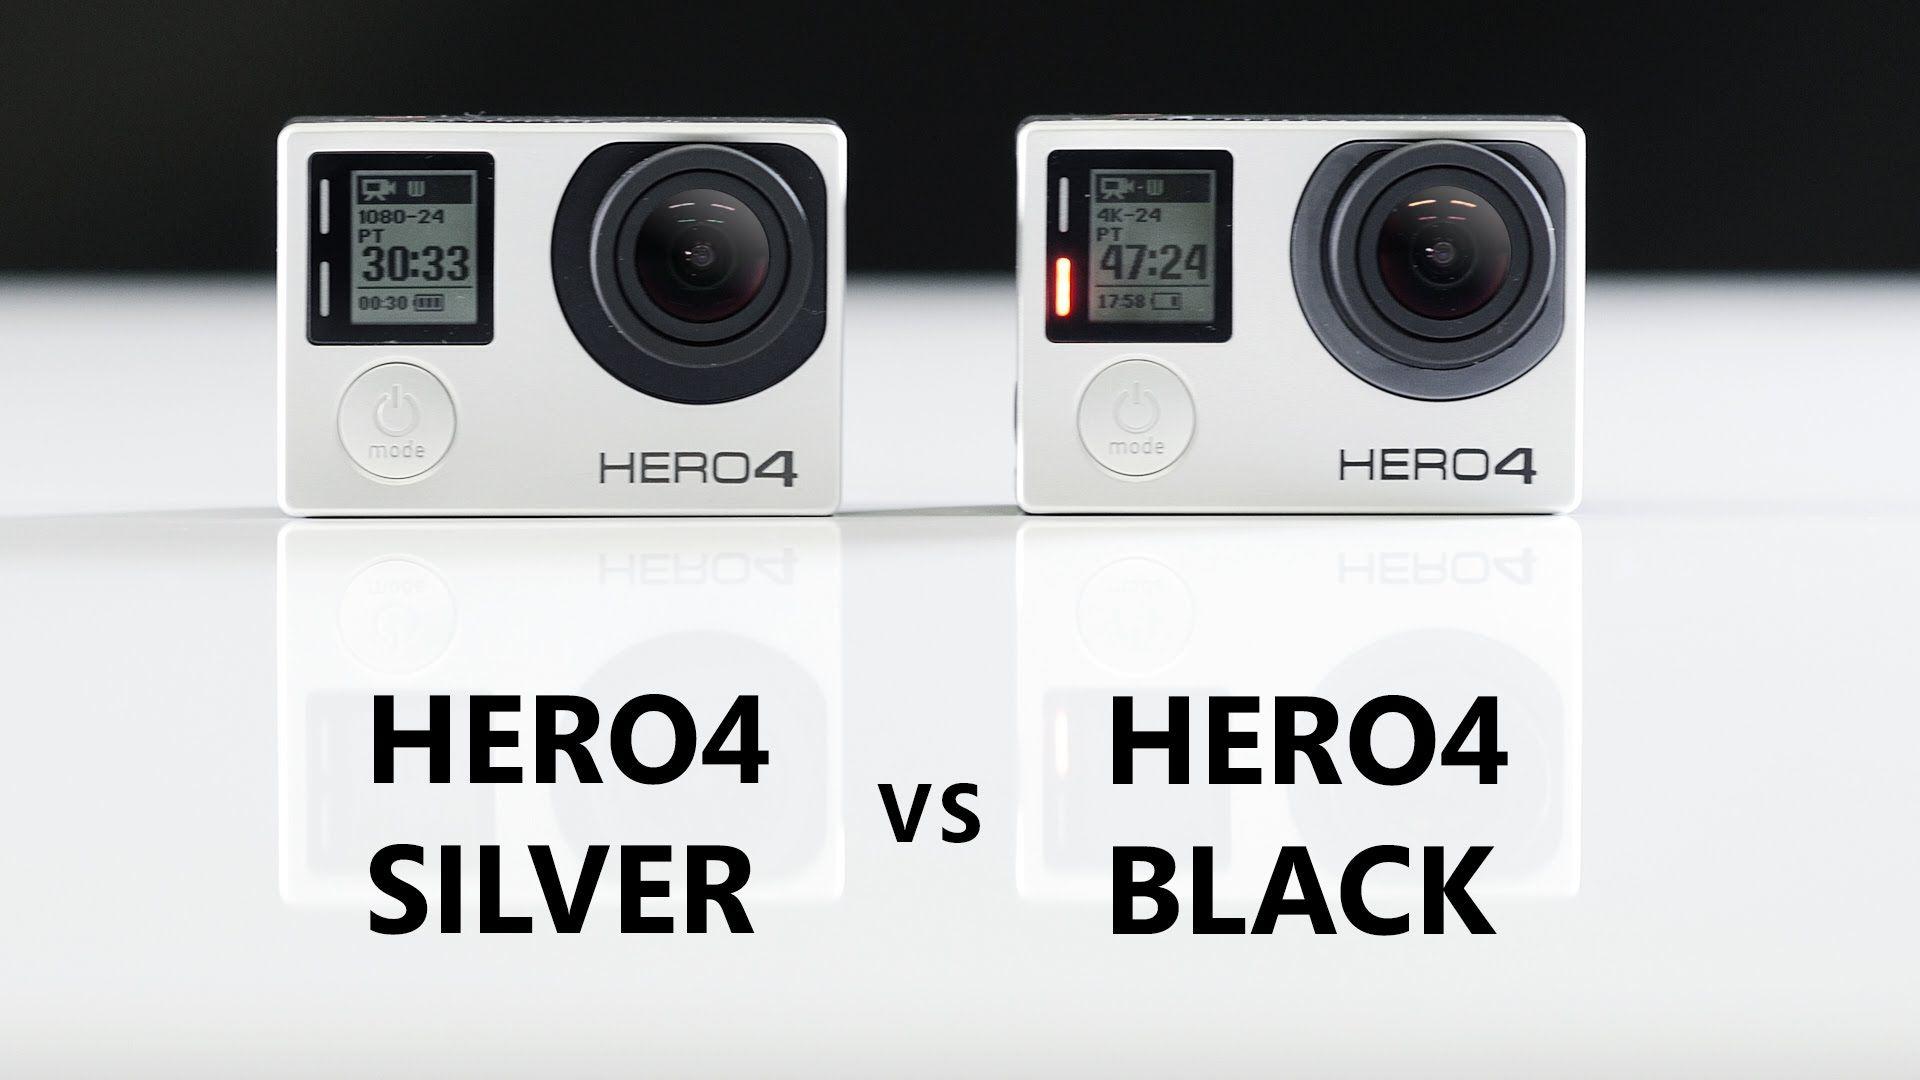 Gopro Hero4 Silver Vs Hero4 Black Comparison And Review Gopro Gopro Hero 4 Black Drone Business